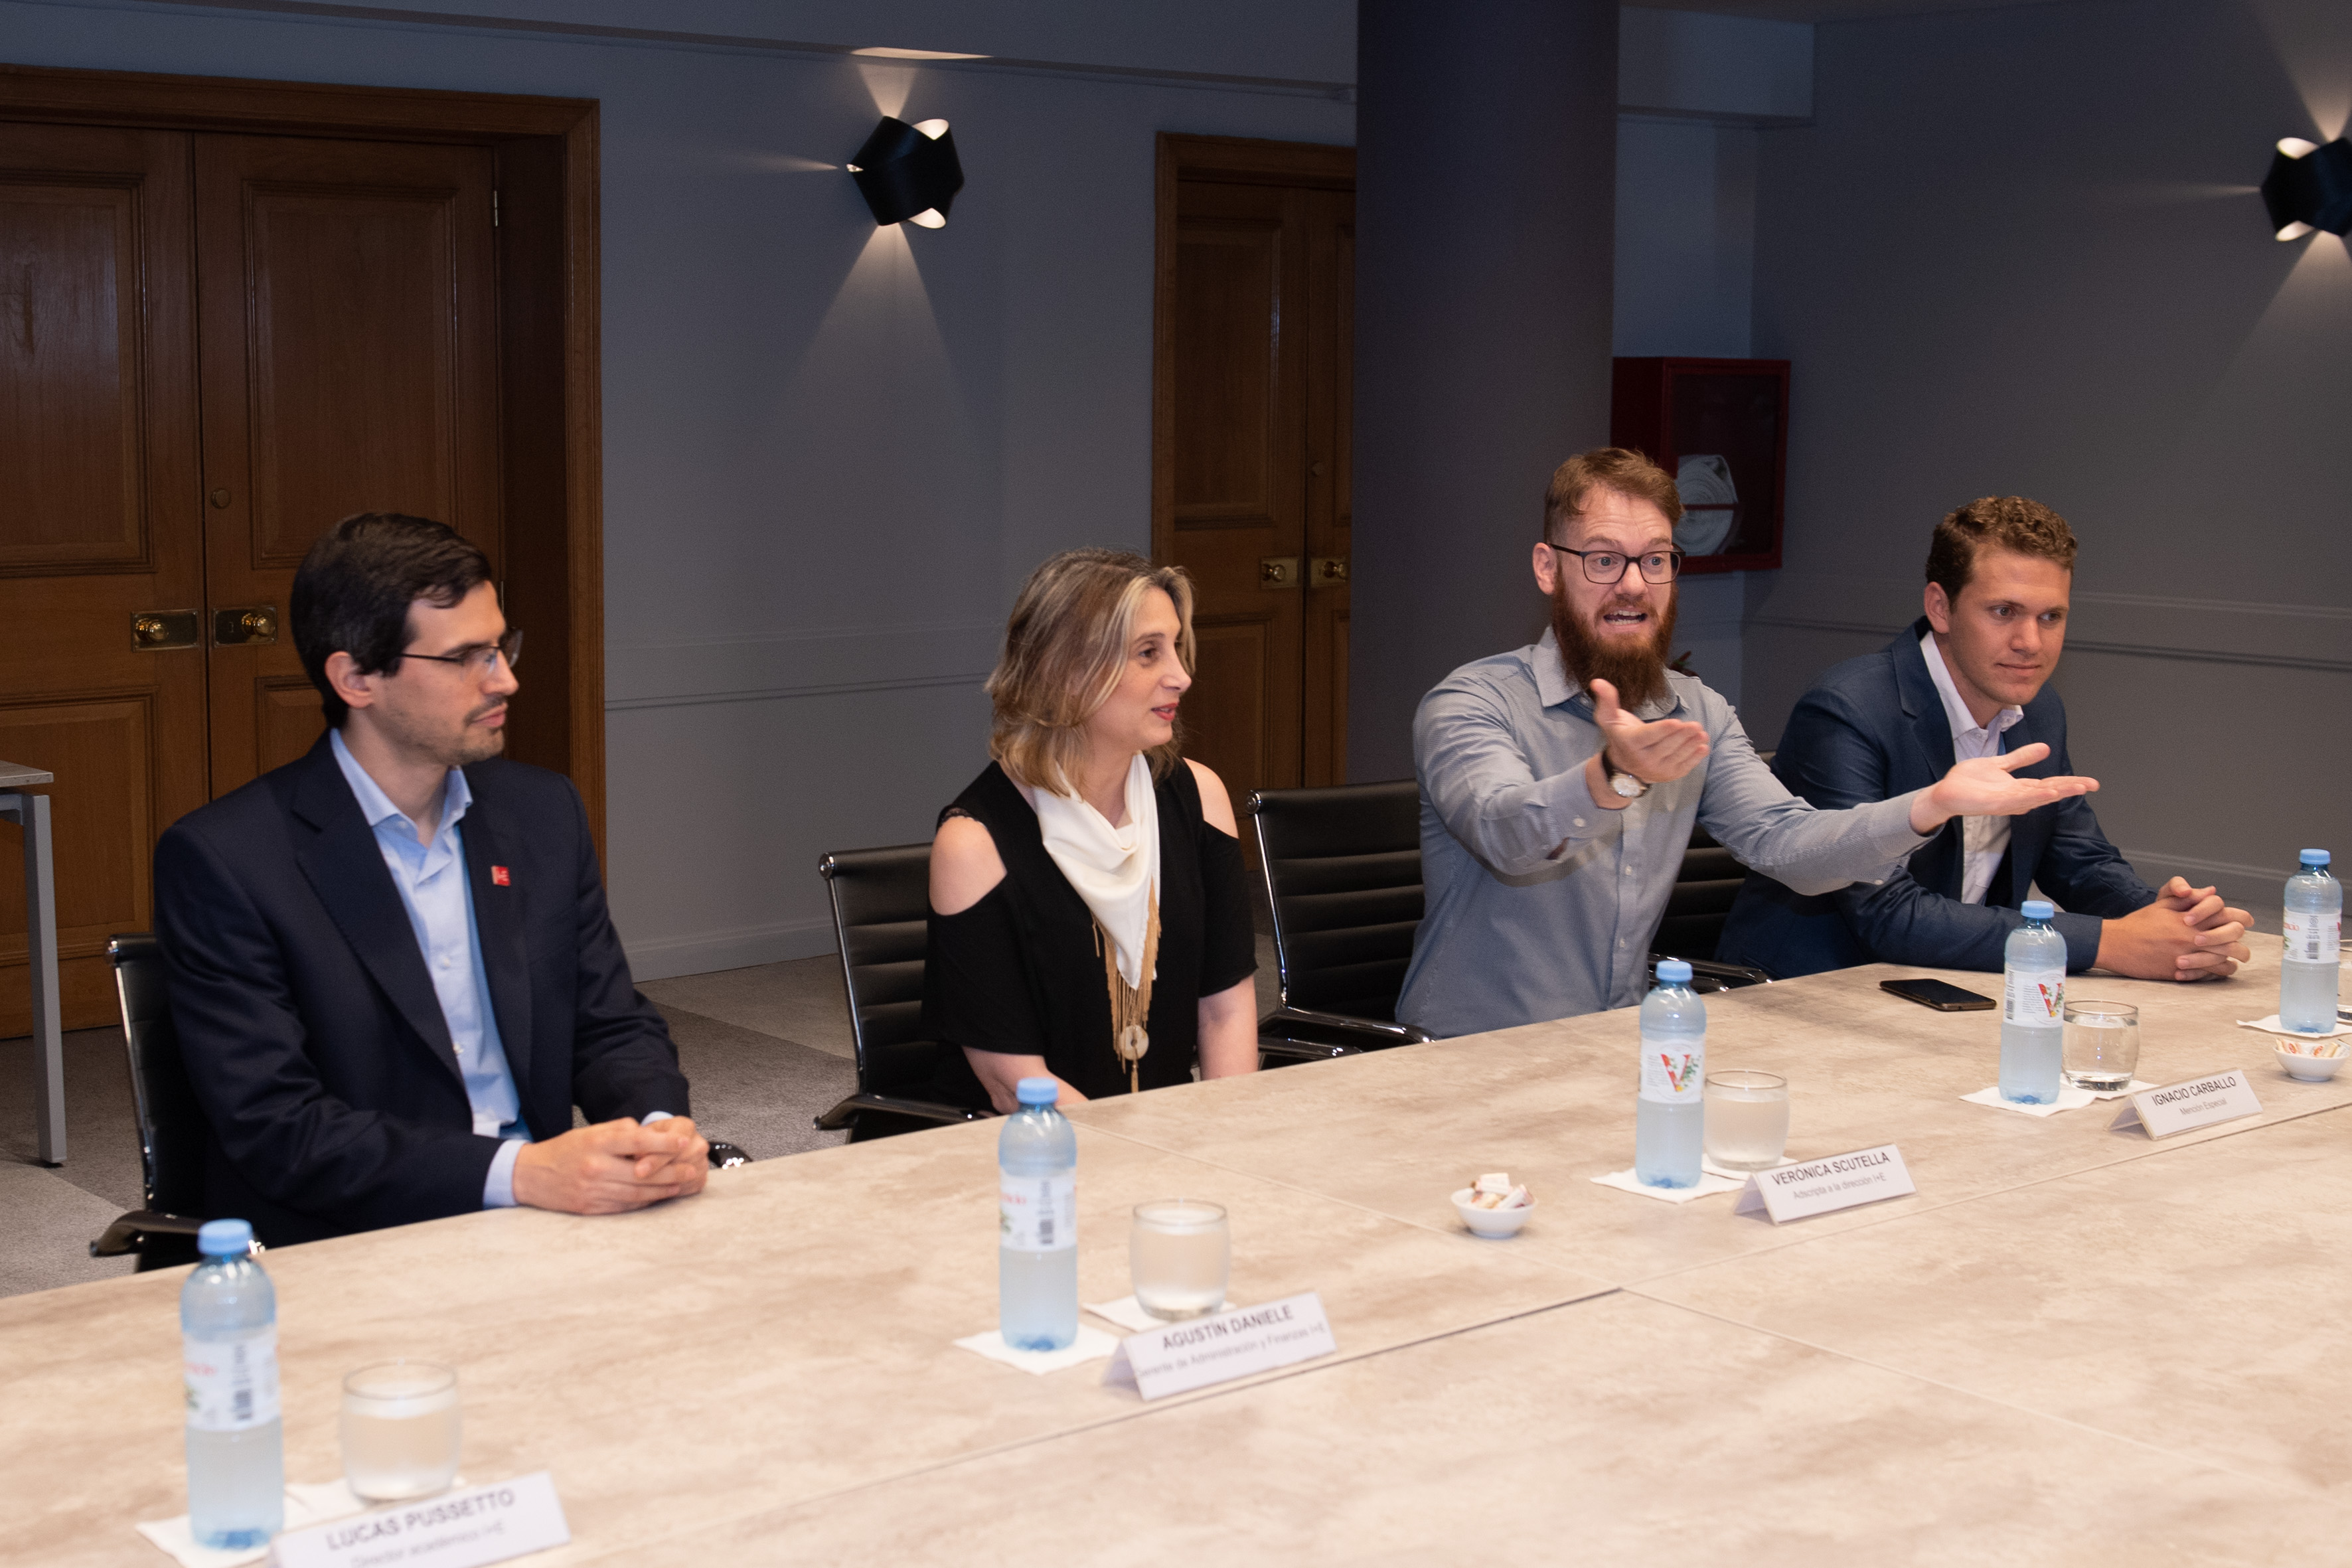 Agustín Daniele y Verónica Sctutella del I+E, Ignacio Esteban Carballo y Mateo Bartolini, participantes destacados del Premio ADEBA